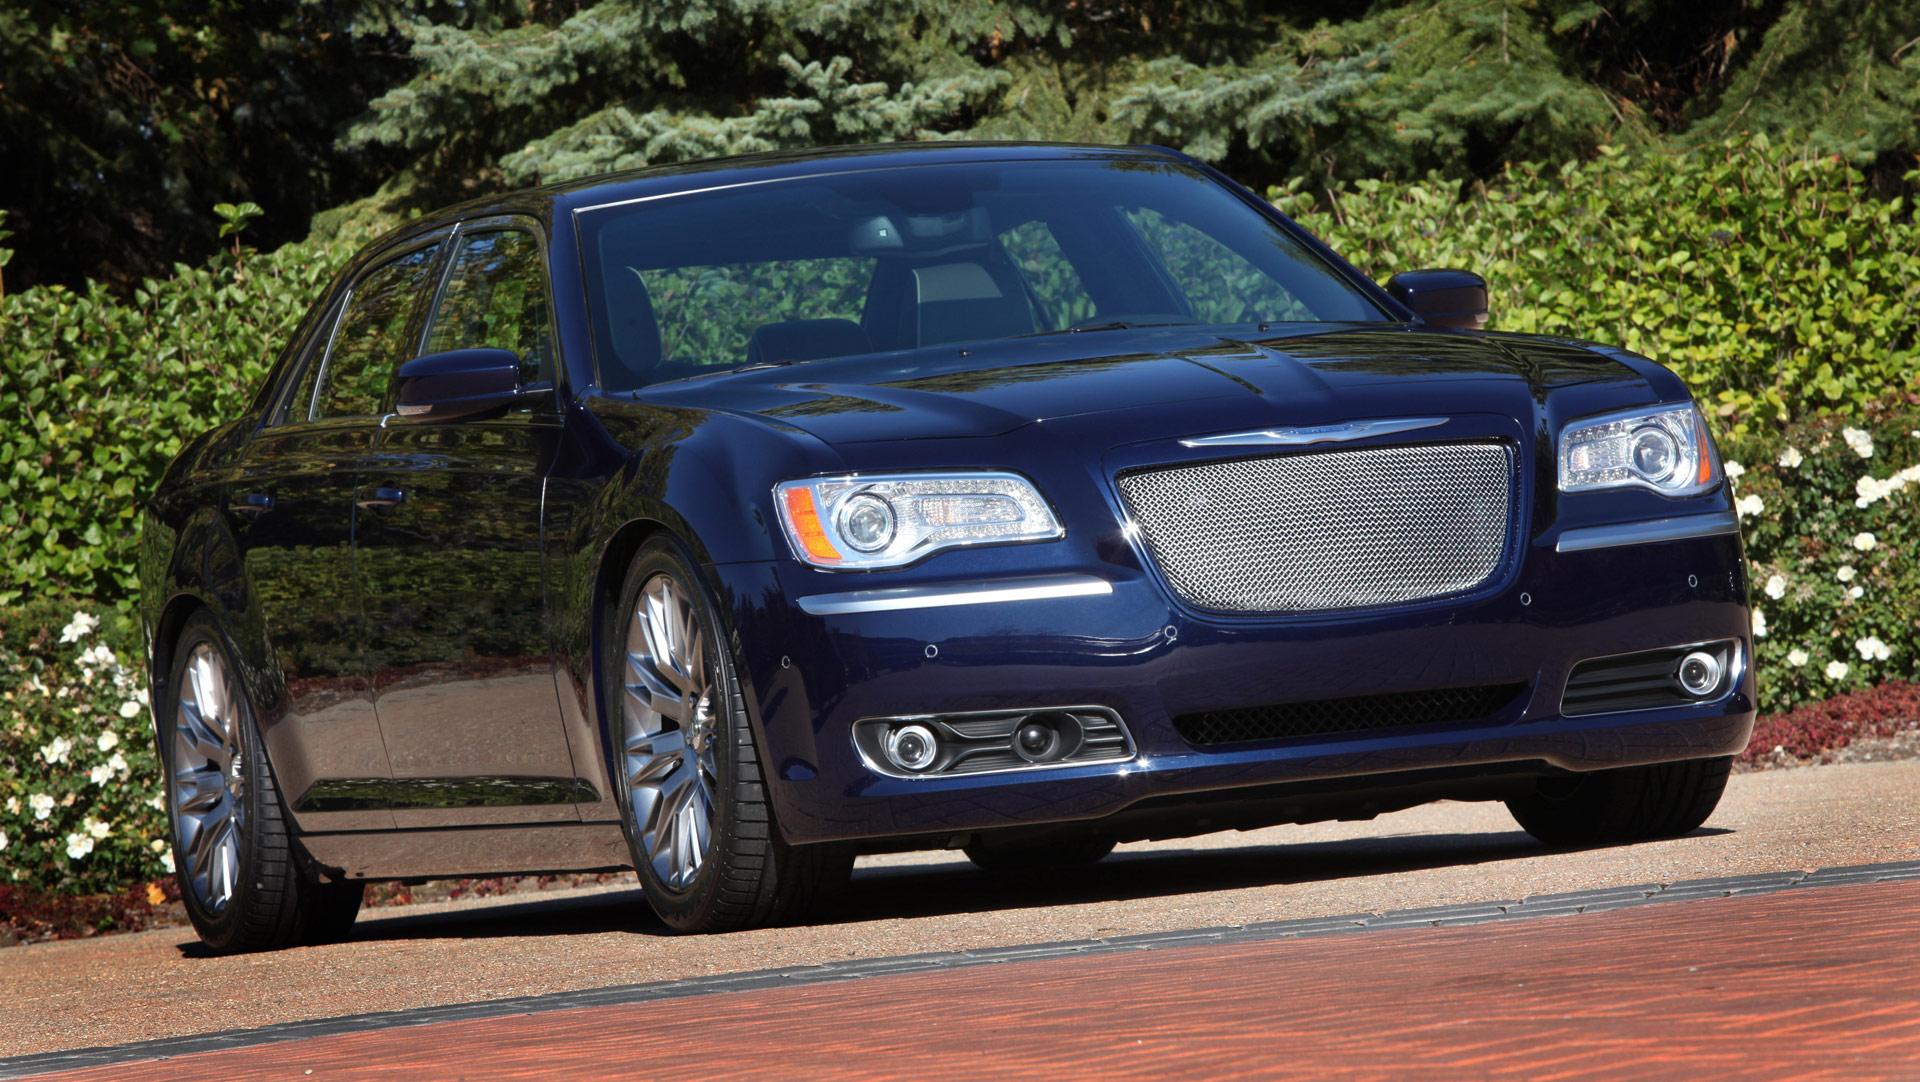 Luxury Vehicle 300: 2012 Chrysler 300 MOPAR Luxury